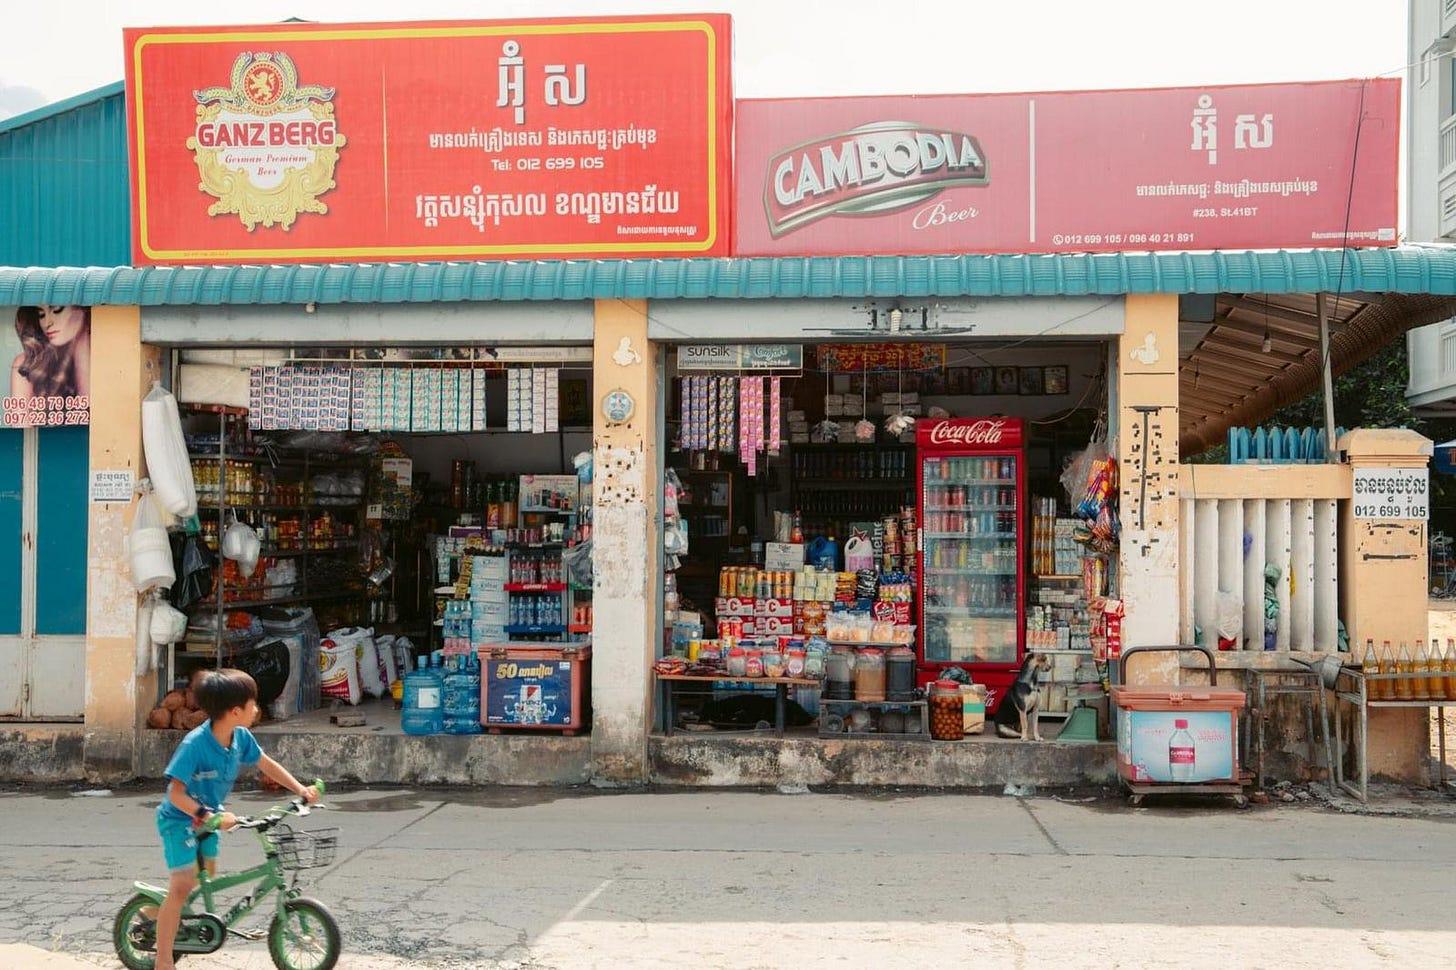 cambodia local culture